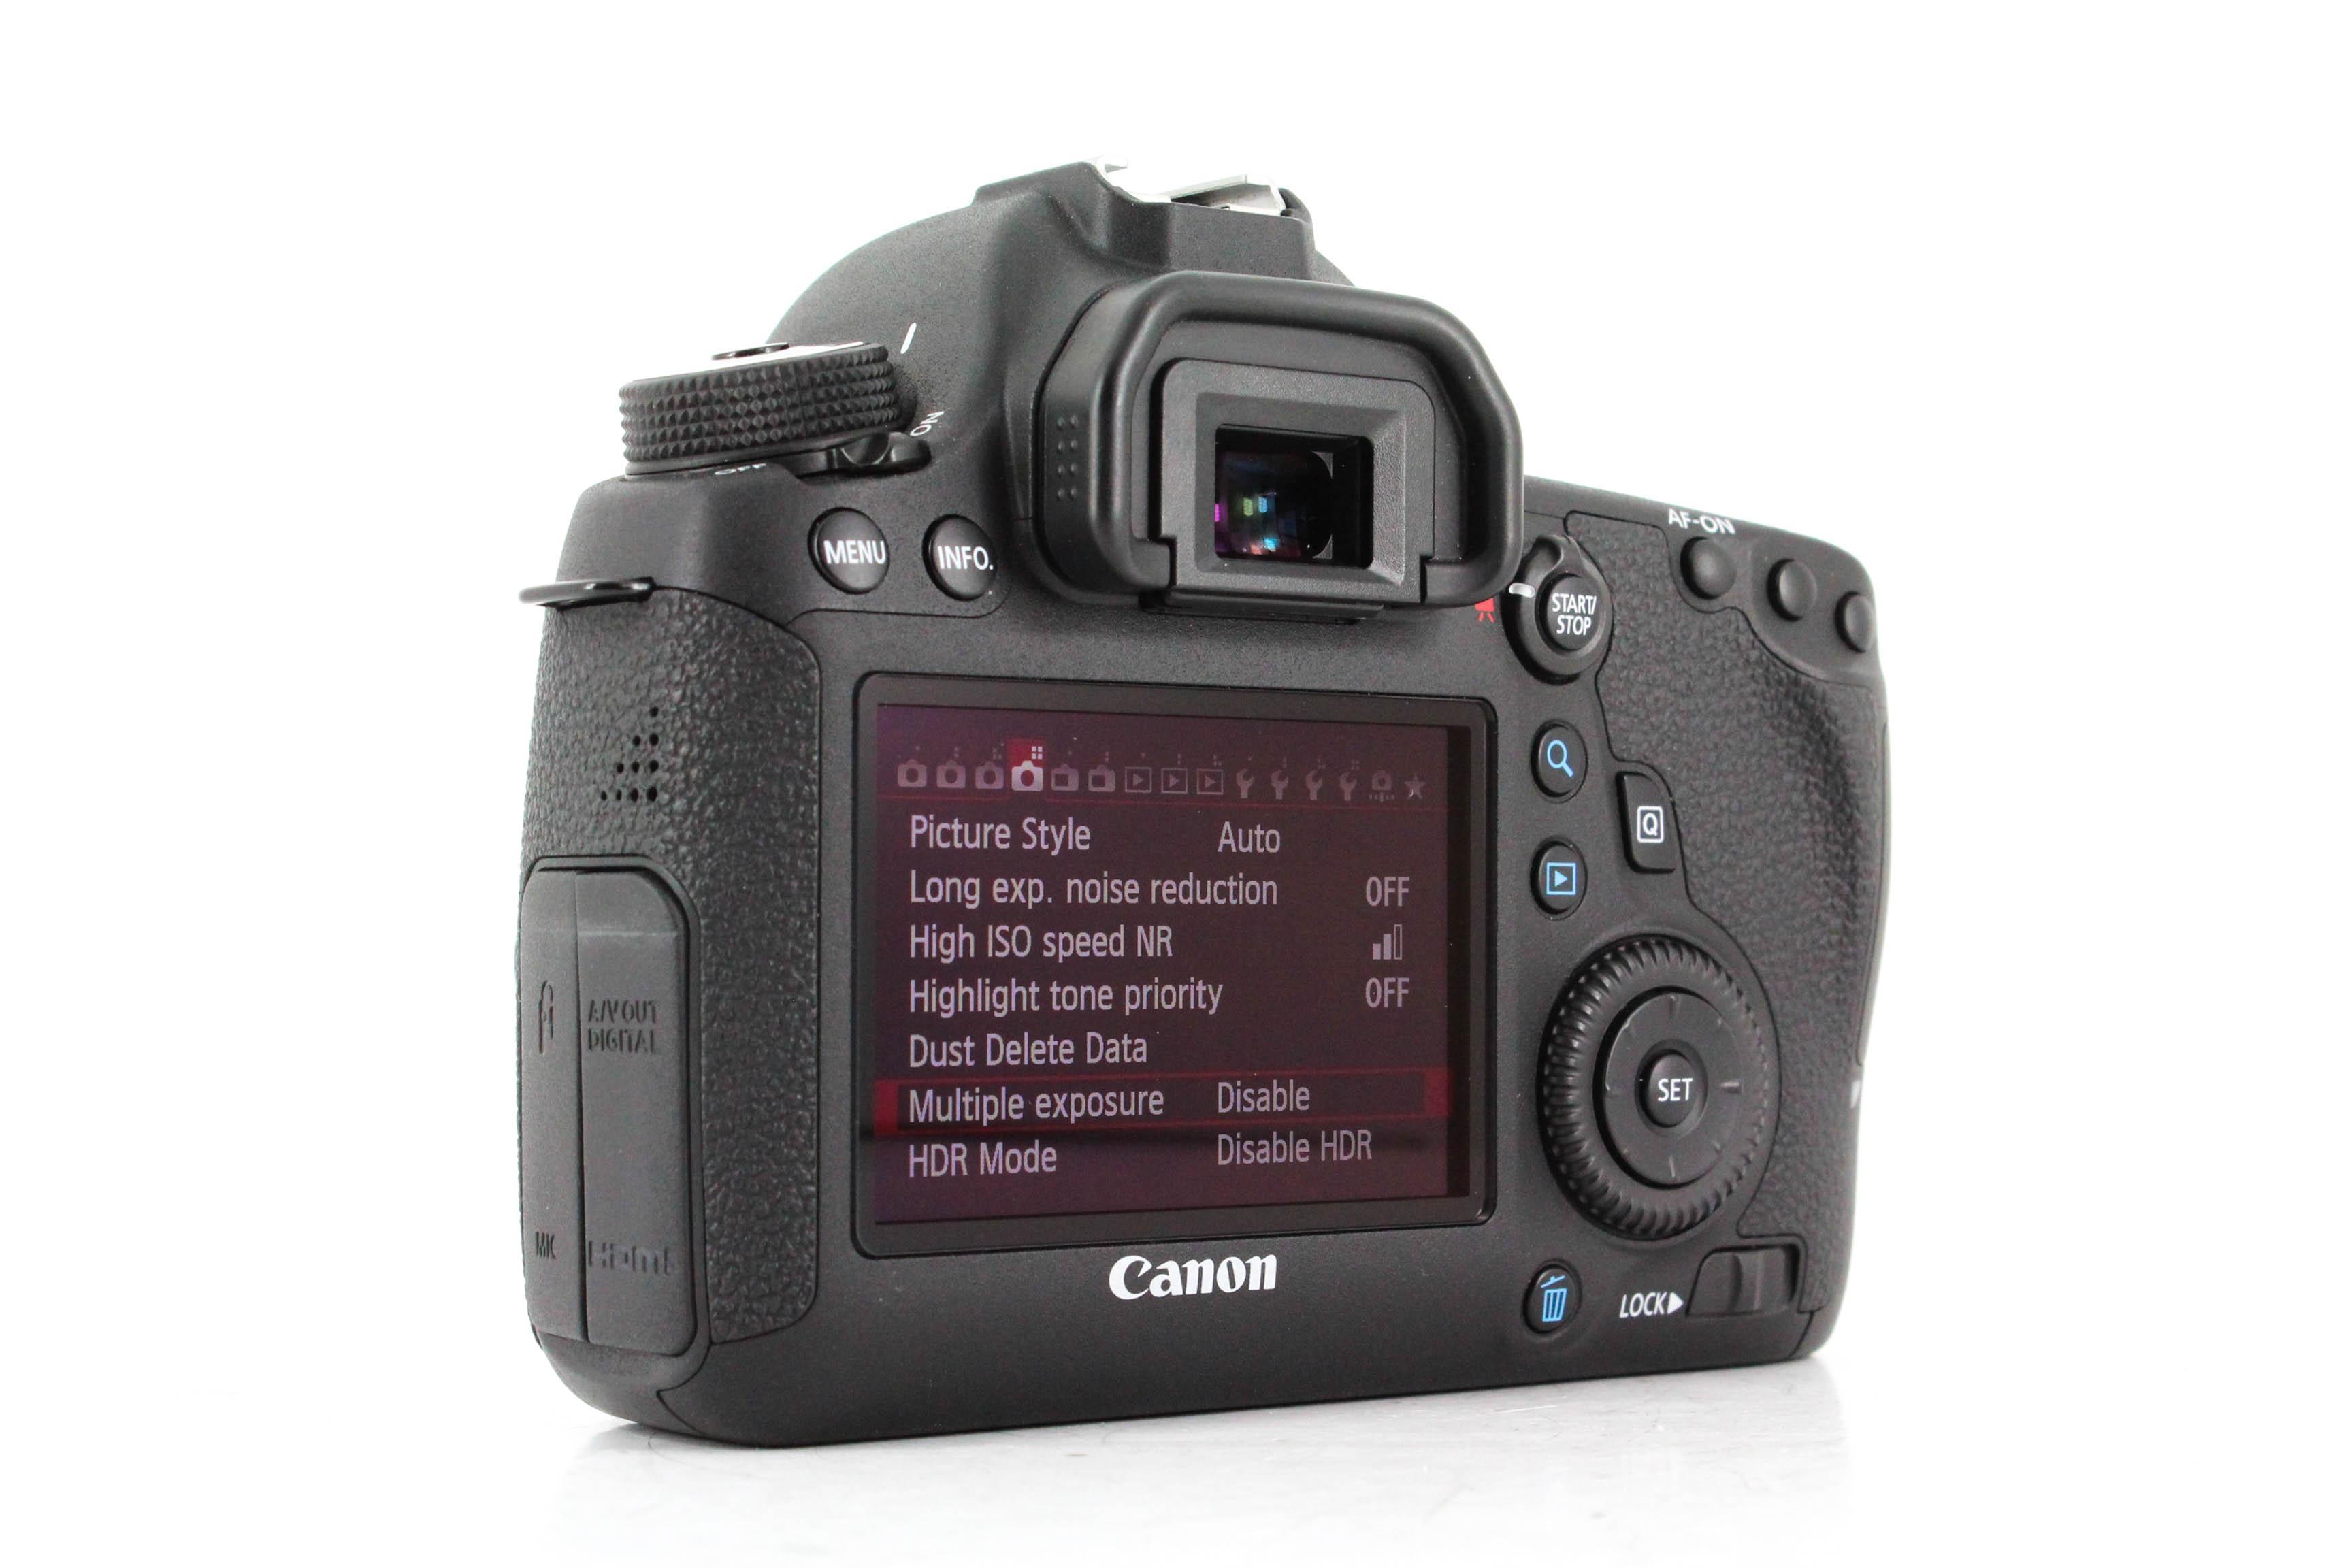 canon eos 6d back image